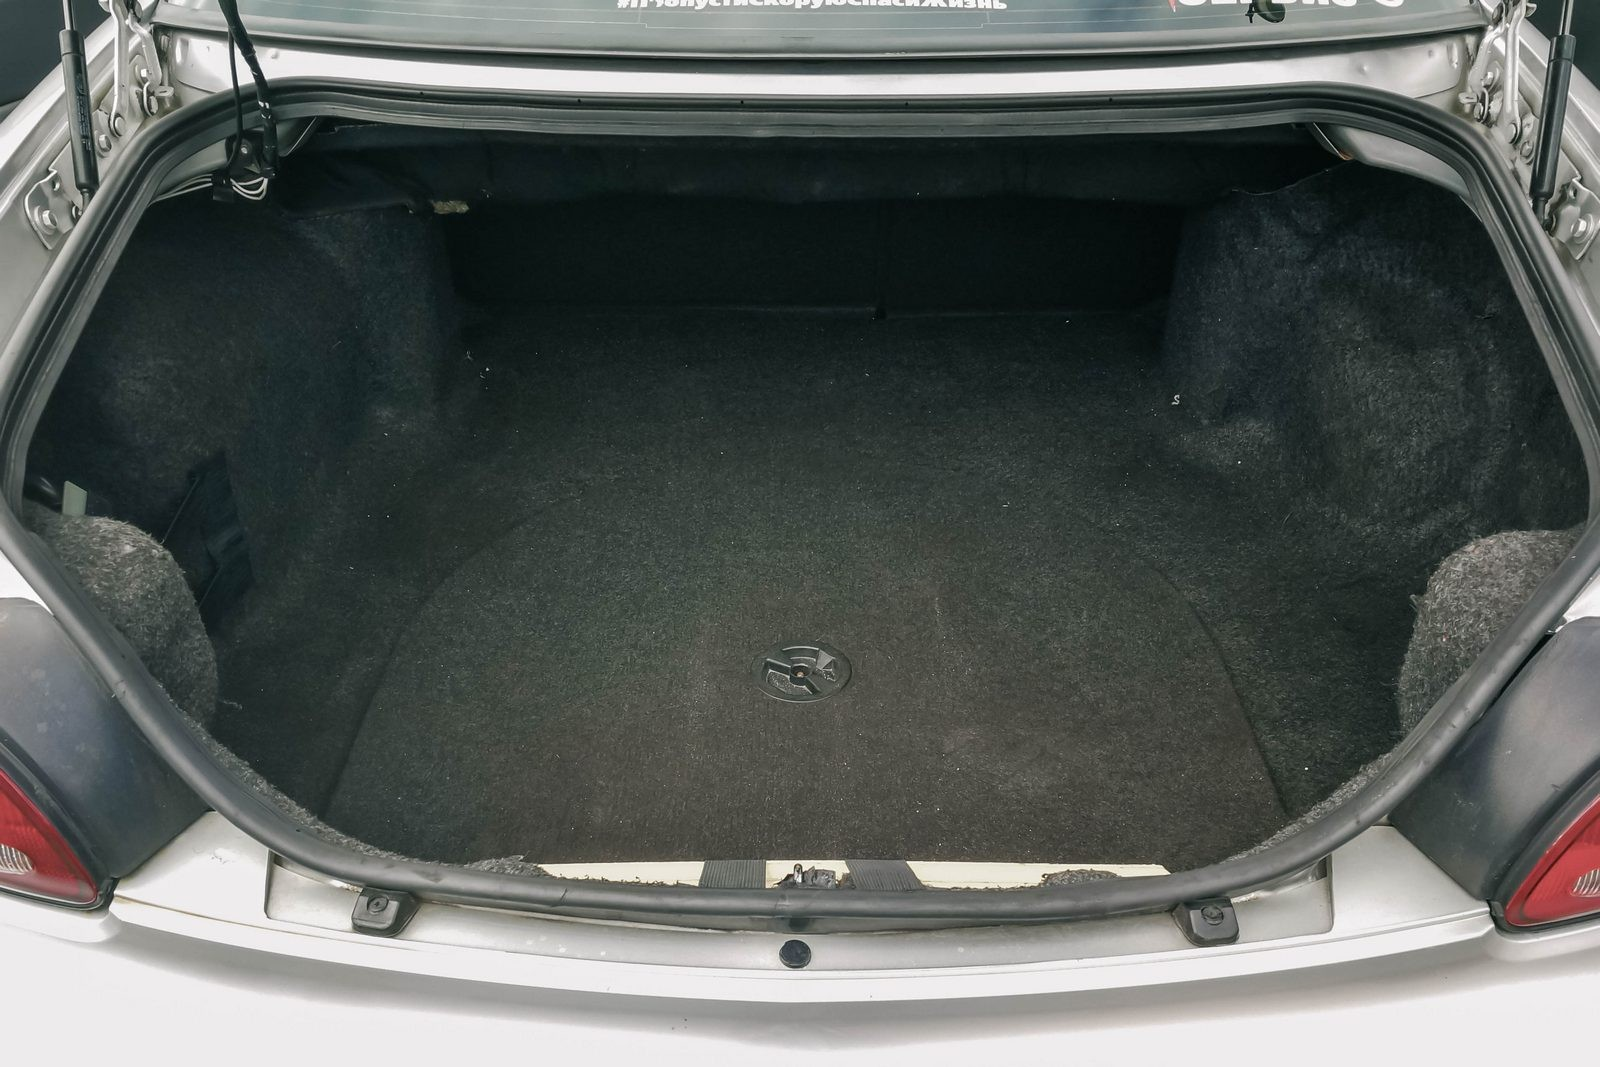 Chrysler Concorde багажник